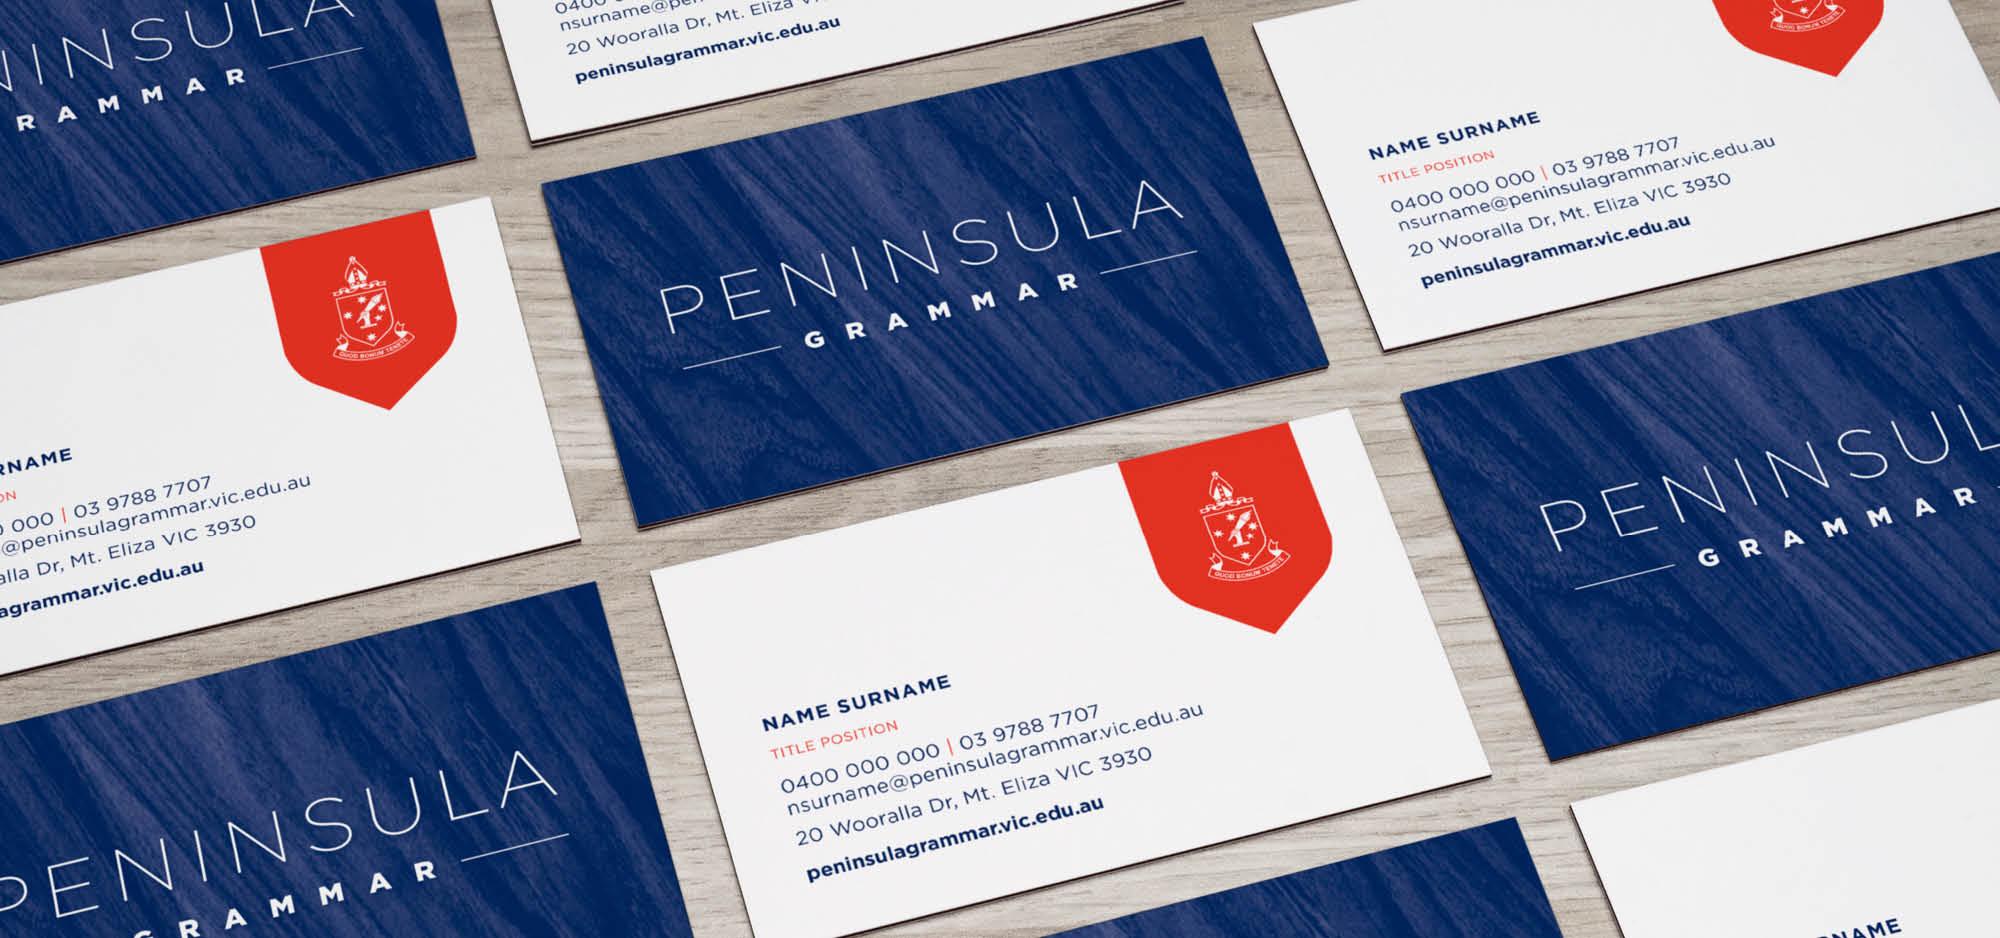 Peninsula Grammar Logo Design and Business Card